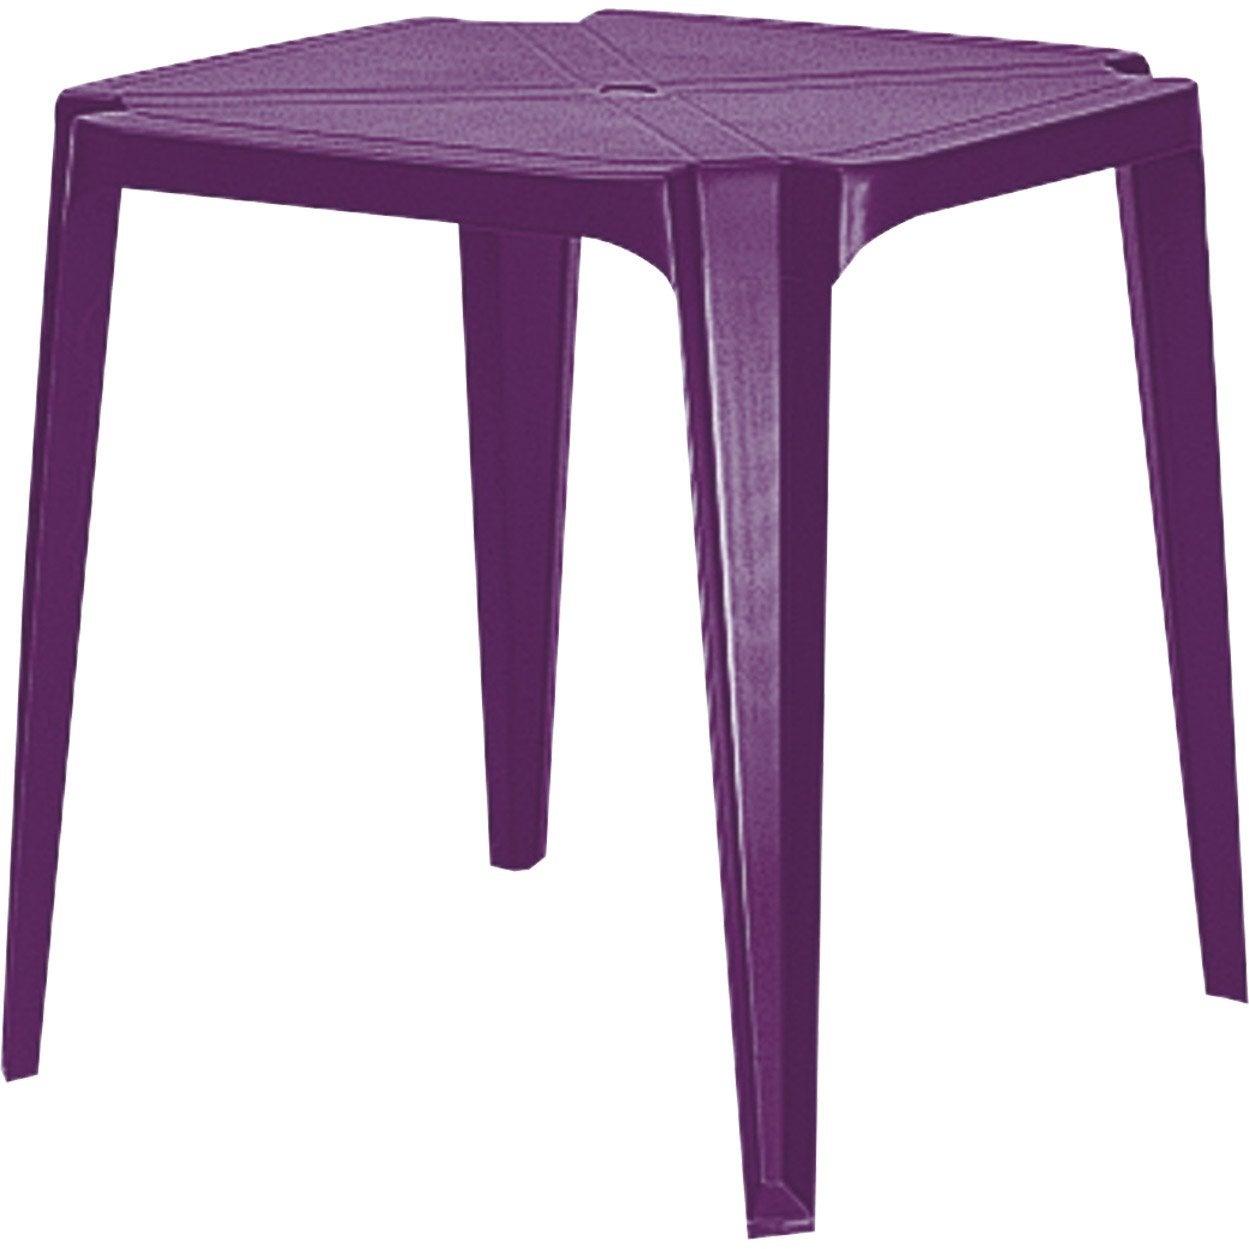 Table de jardin en r sine sun purple grosfillex leroy merlin - Leroy merlin table de jardin en resine ...